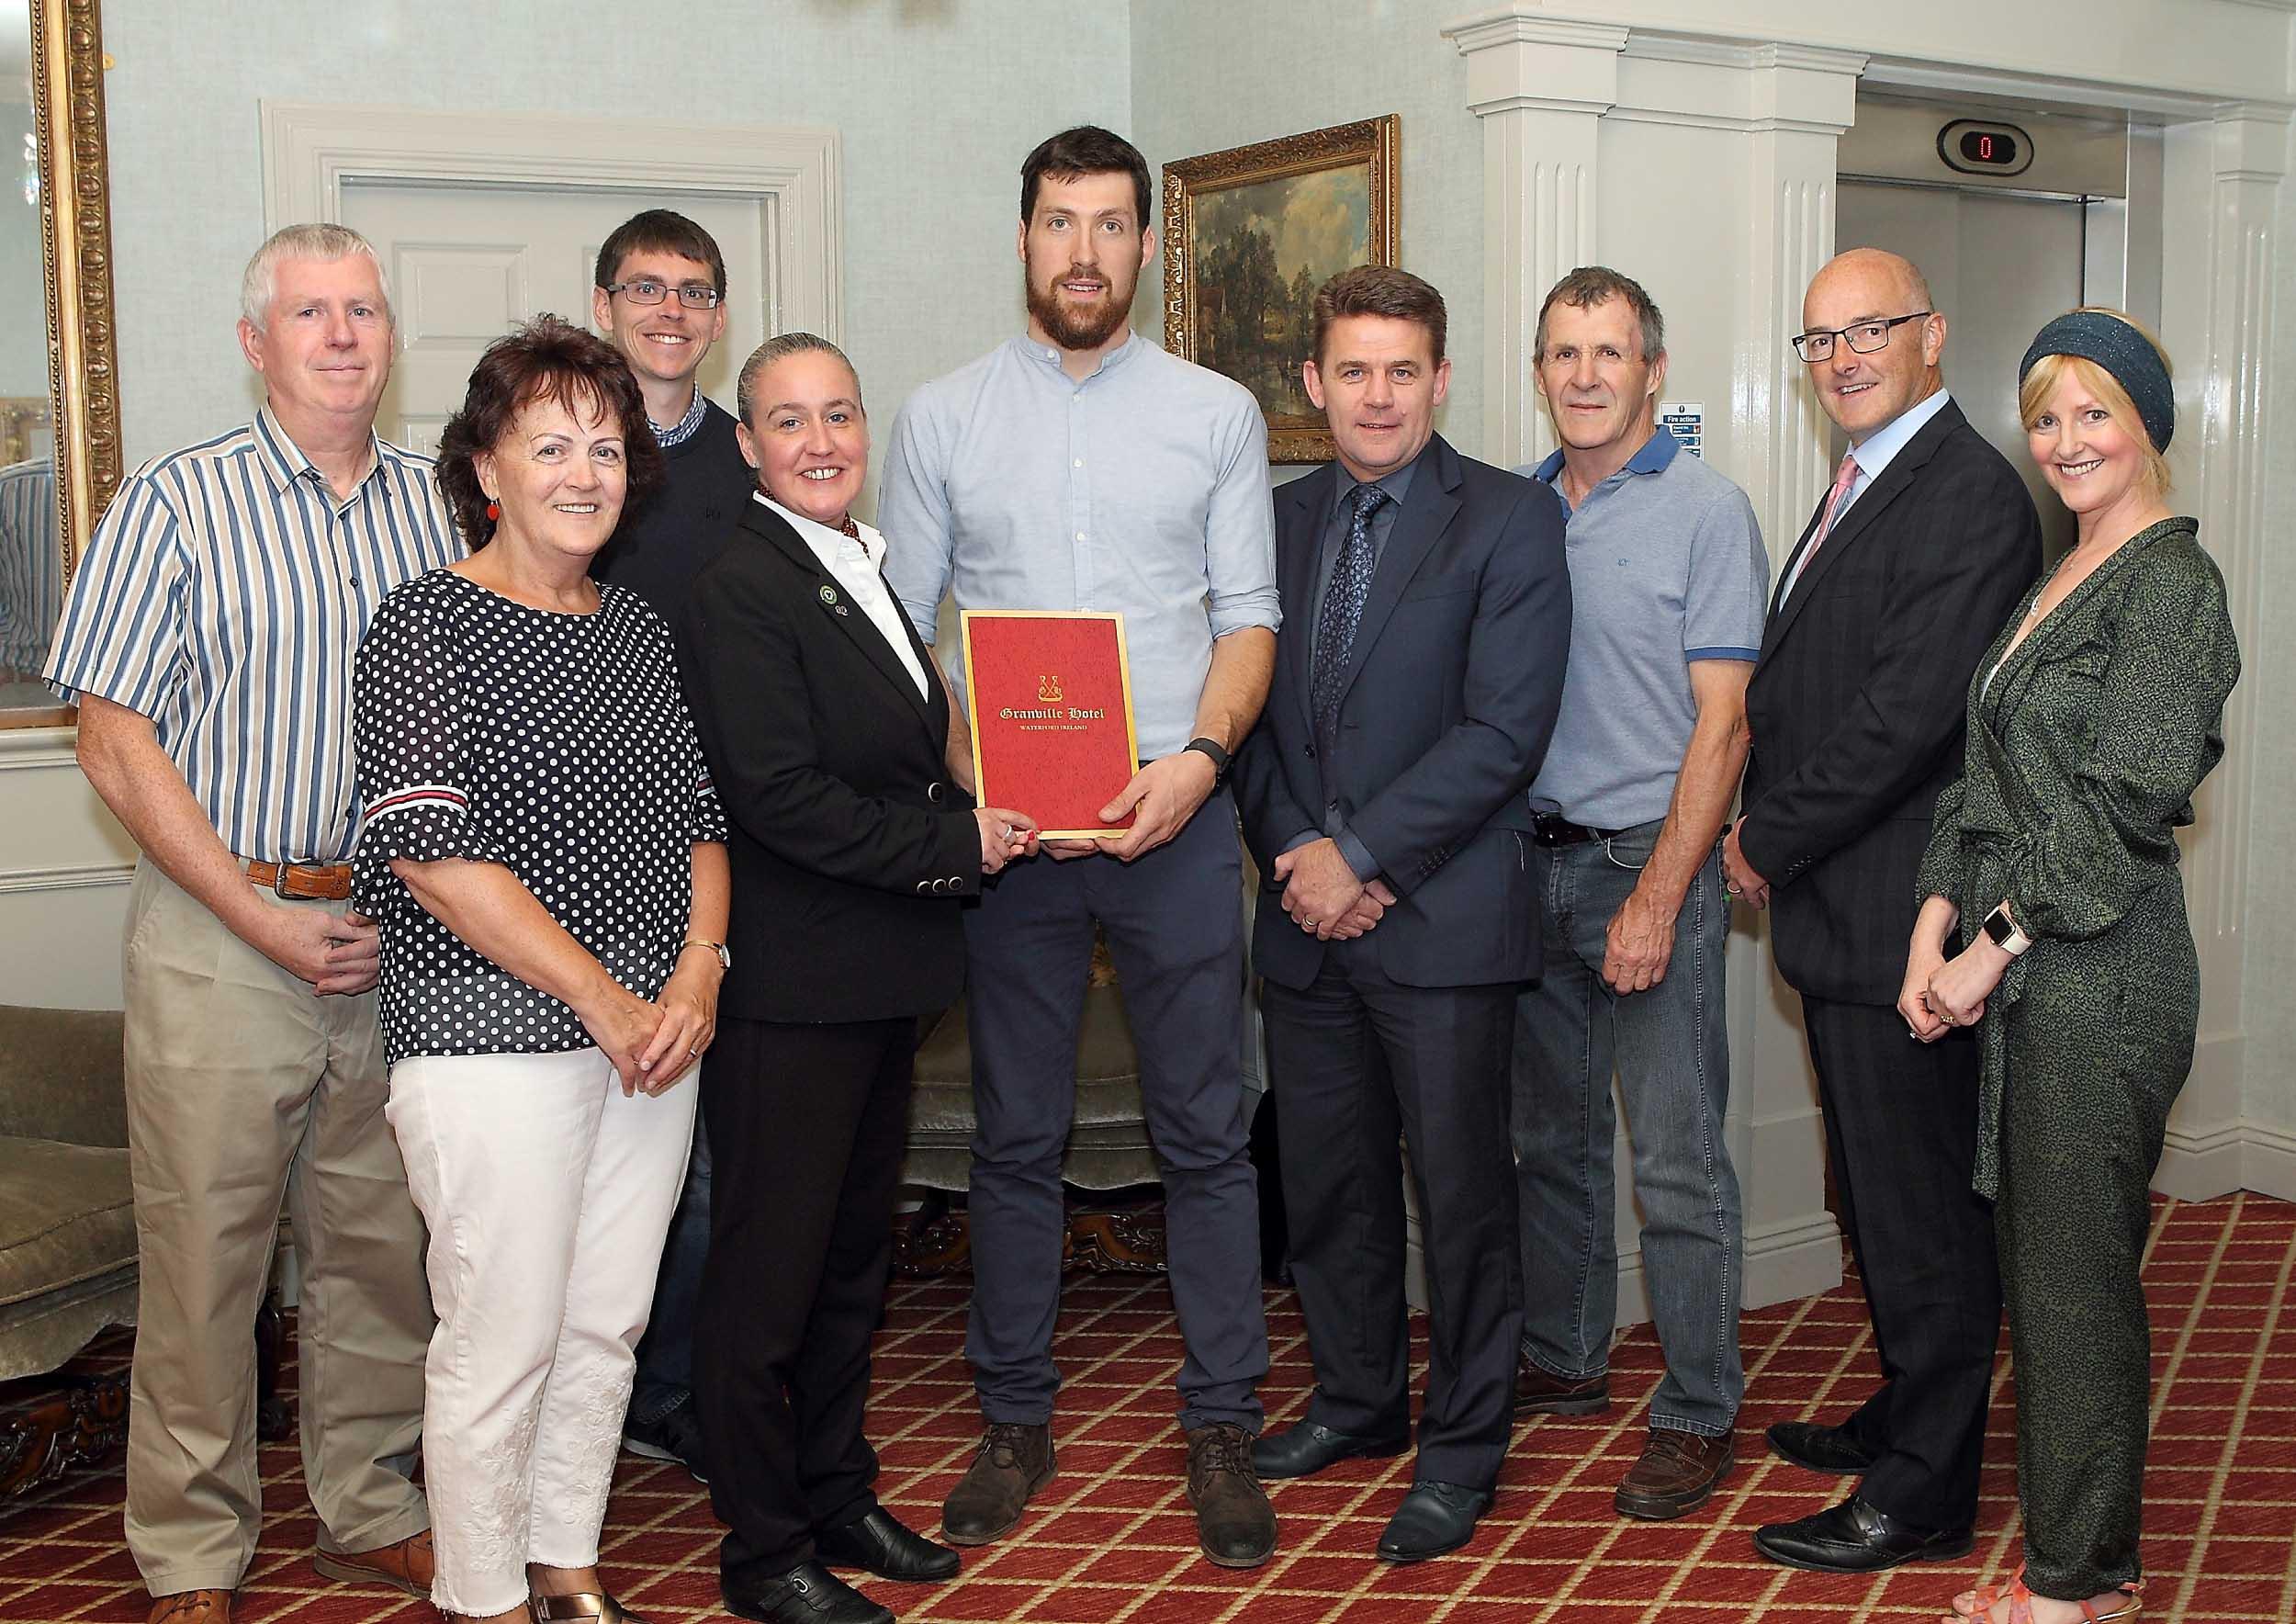 Tommy Prendergast  is the June winner of the WLR Granville Hotel GAA Award